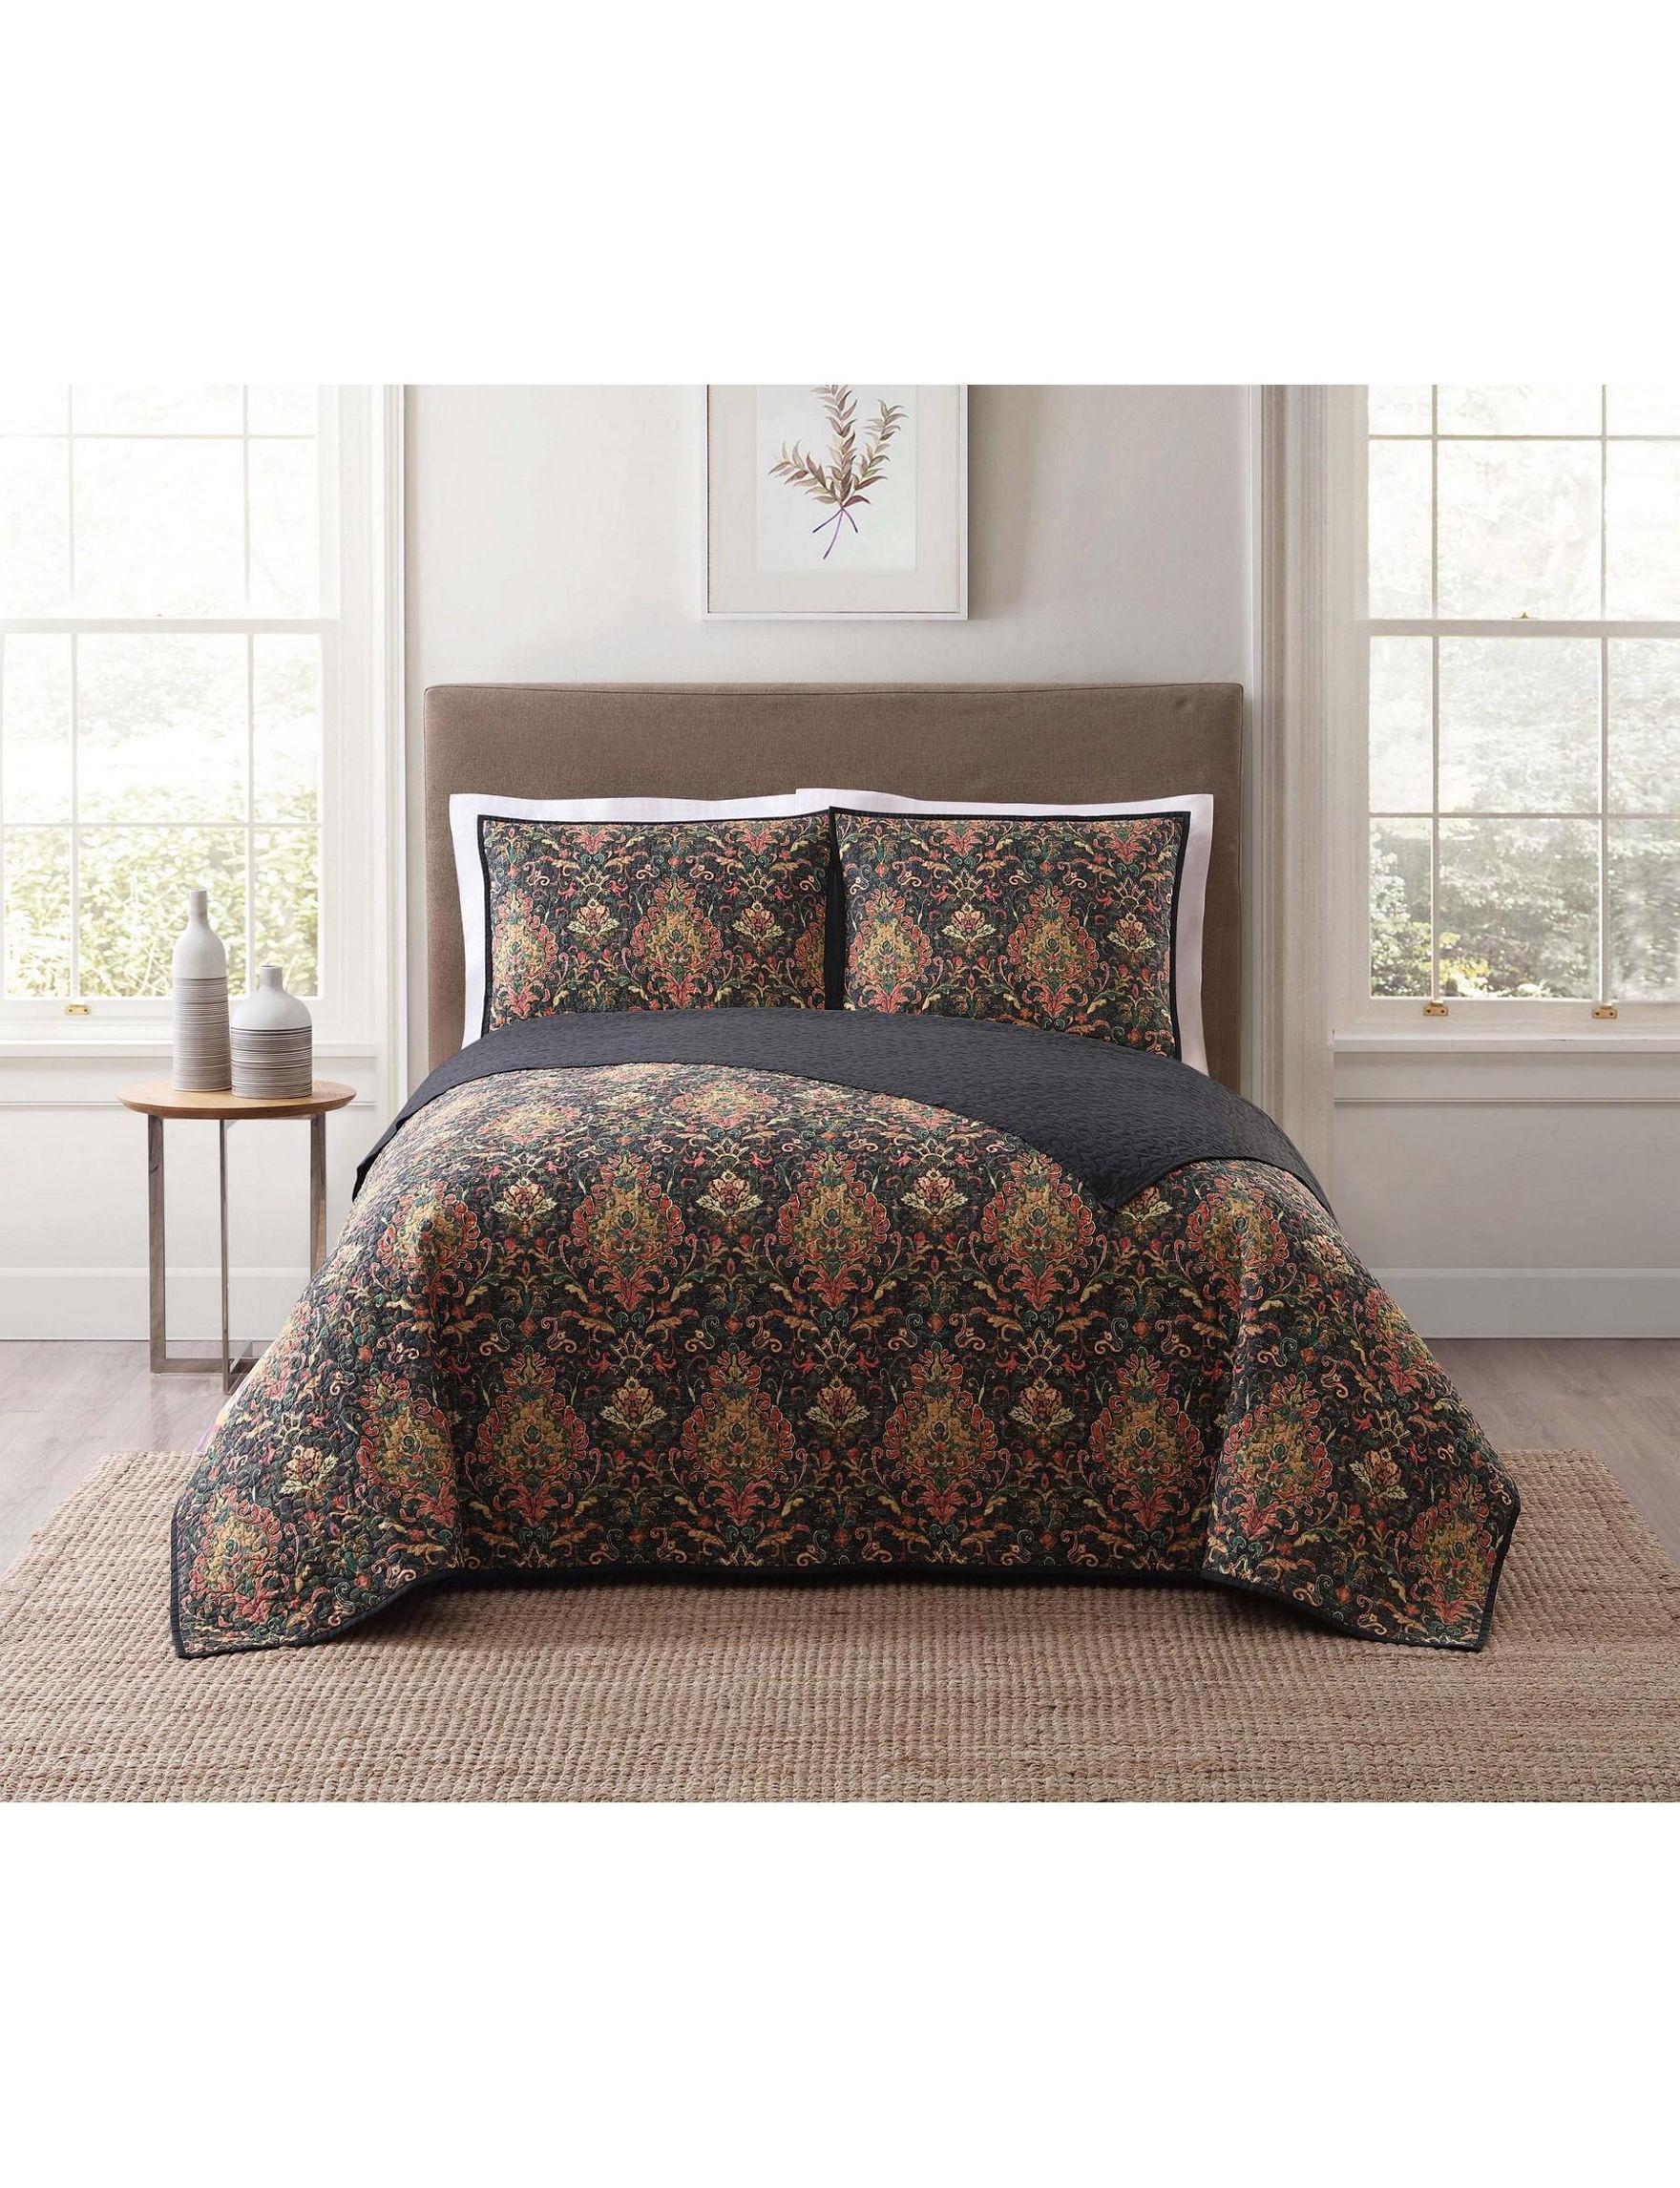 Style 212 Black Multi Quilts & Quilt Sets